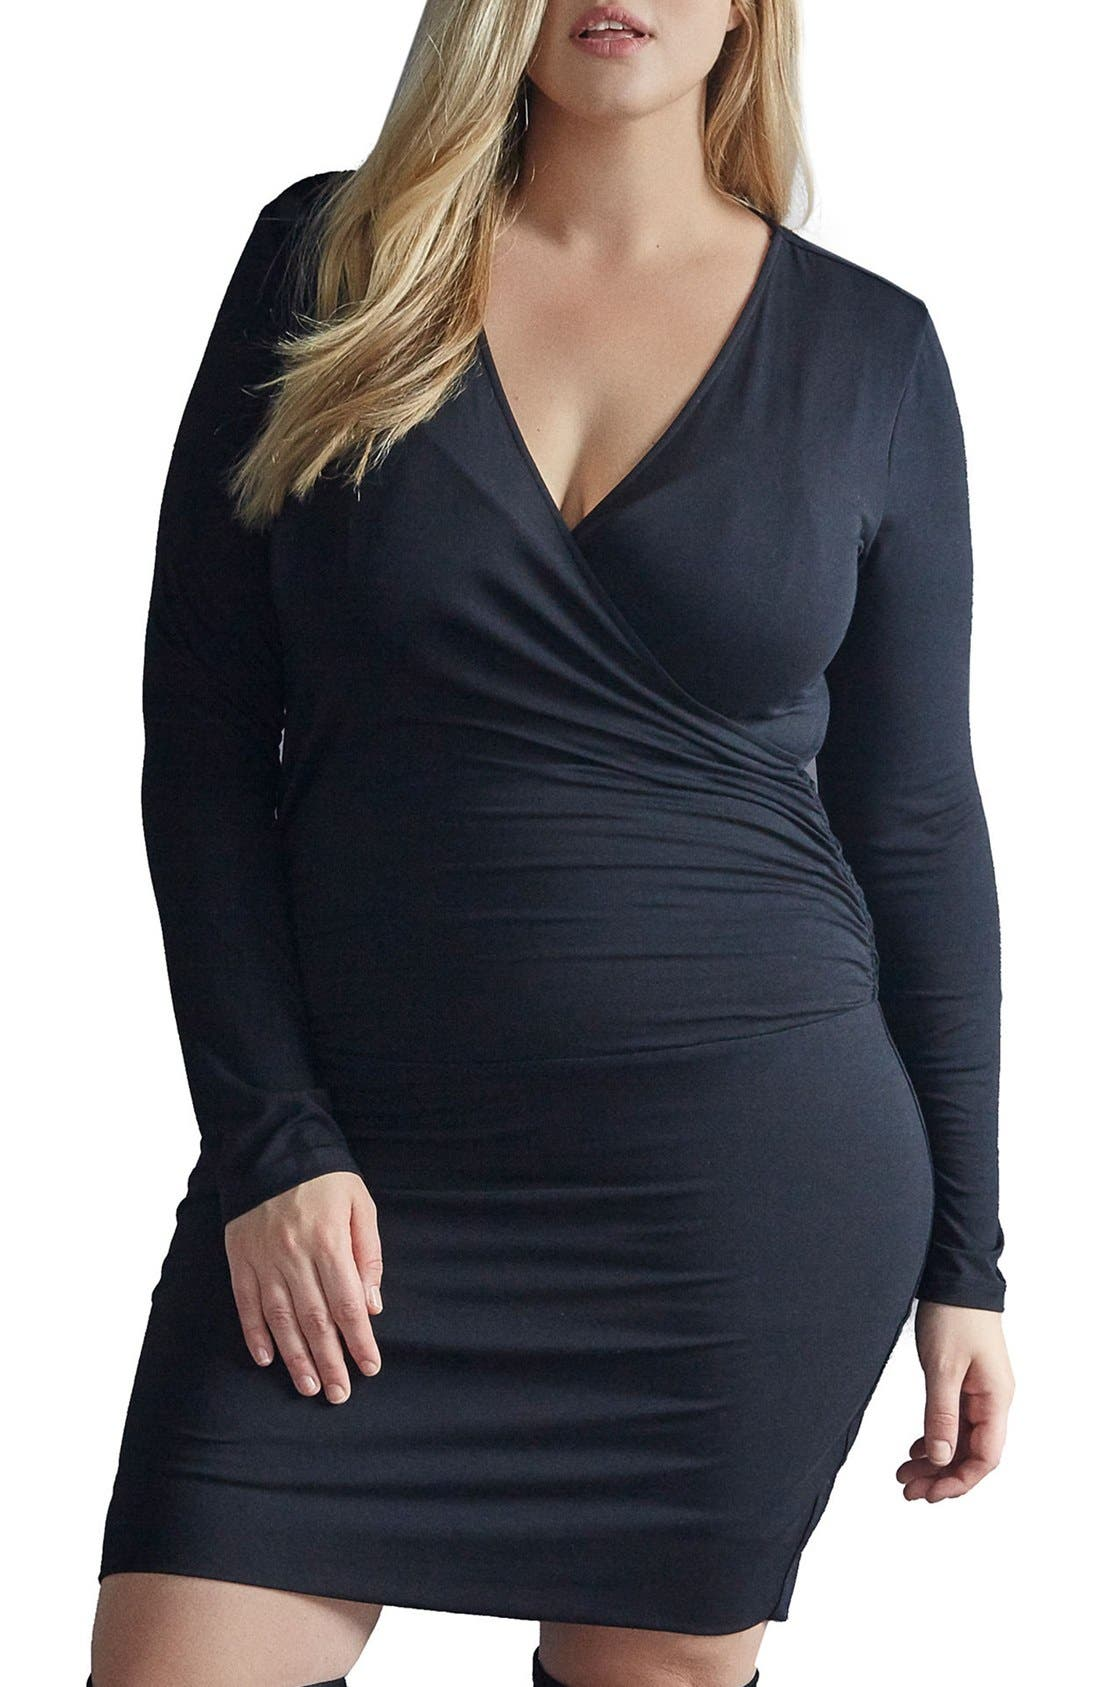 Plus Size Tart Peaches Surplice Body-Con Dress